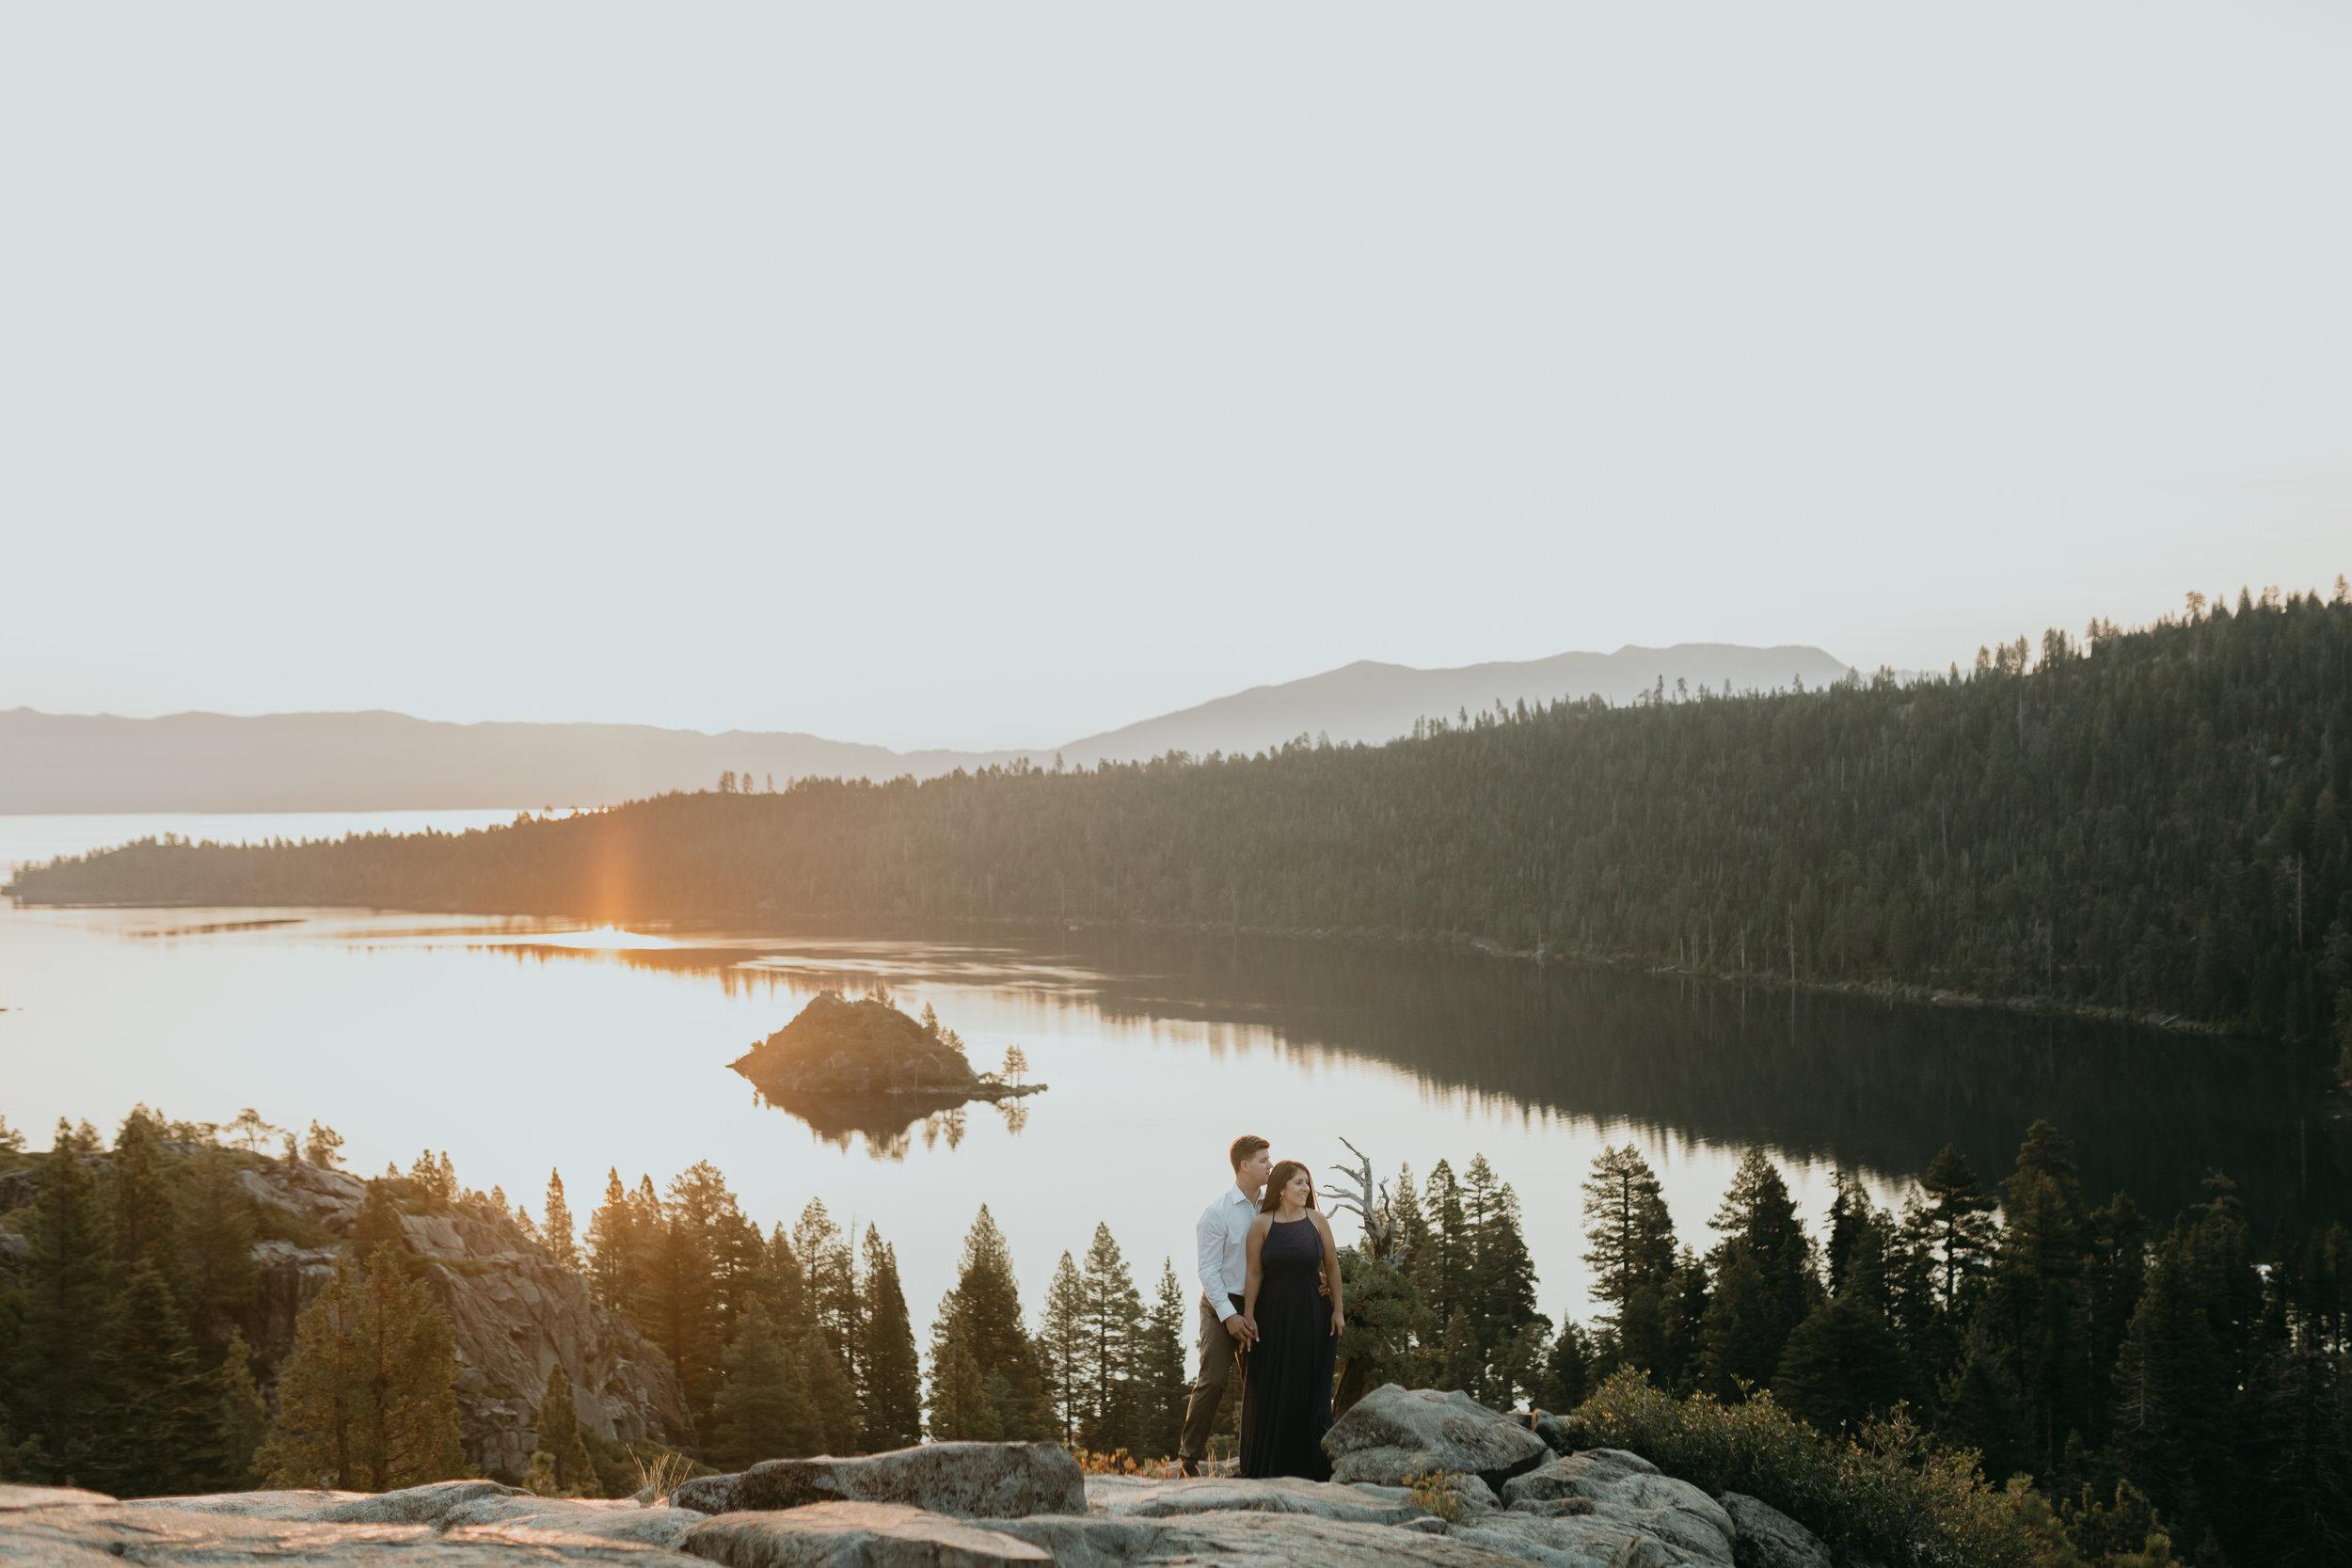 nicole-daacke-photography-lake-tahoe-sunrise-summer-adventure-engagement-photos-nevada-wedding-elopement-photographer-golden-emerald-bay-light-pine-trees-summer-vibe-fun-carefree-authentic-love-18.jpg